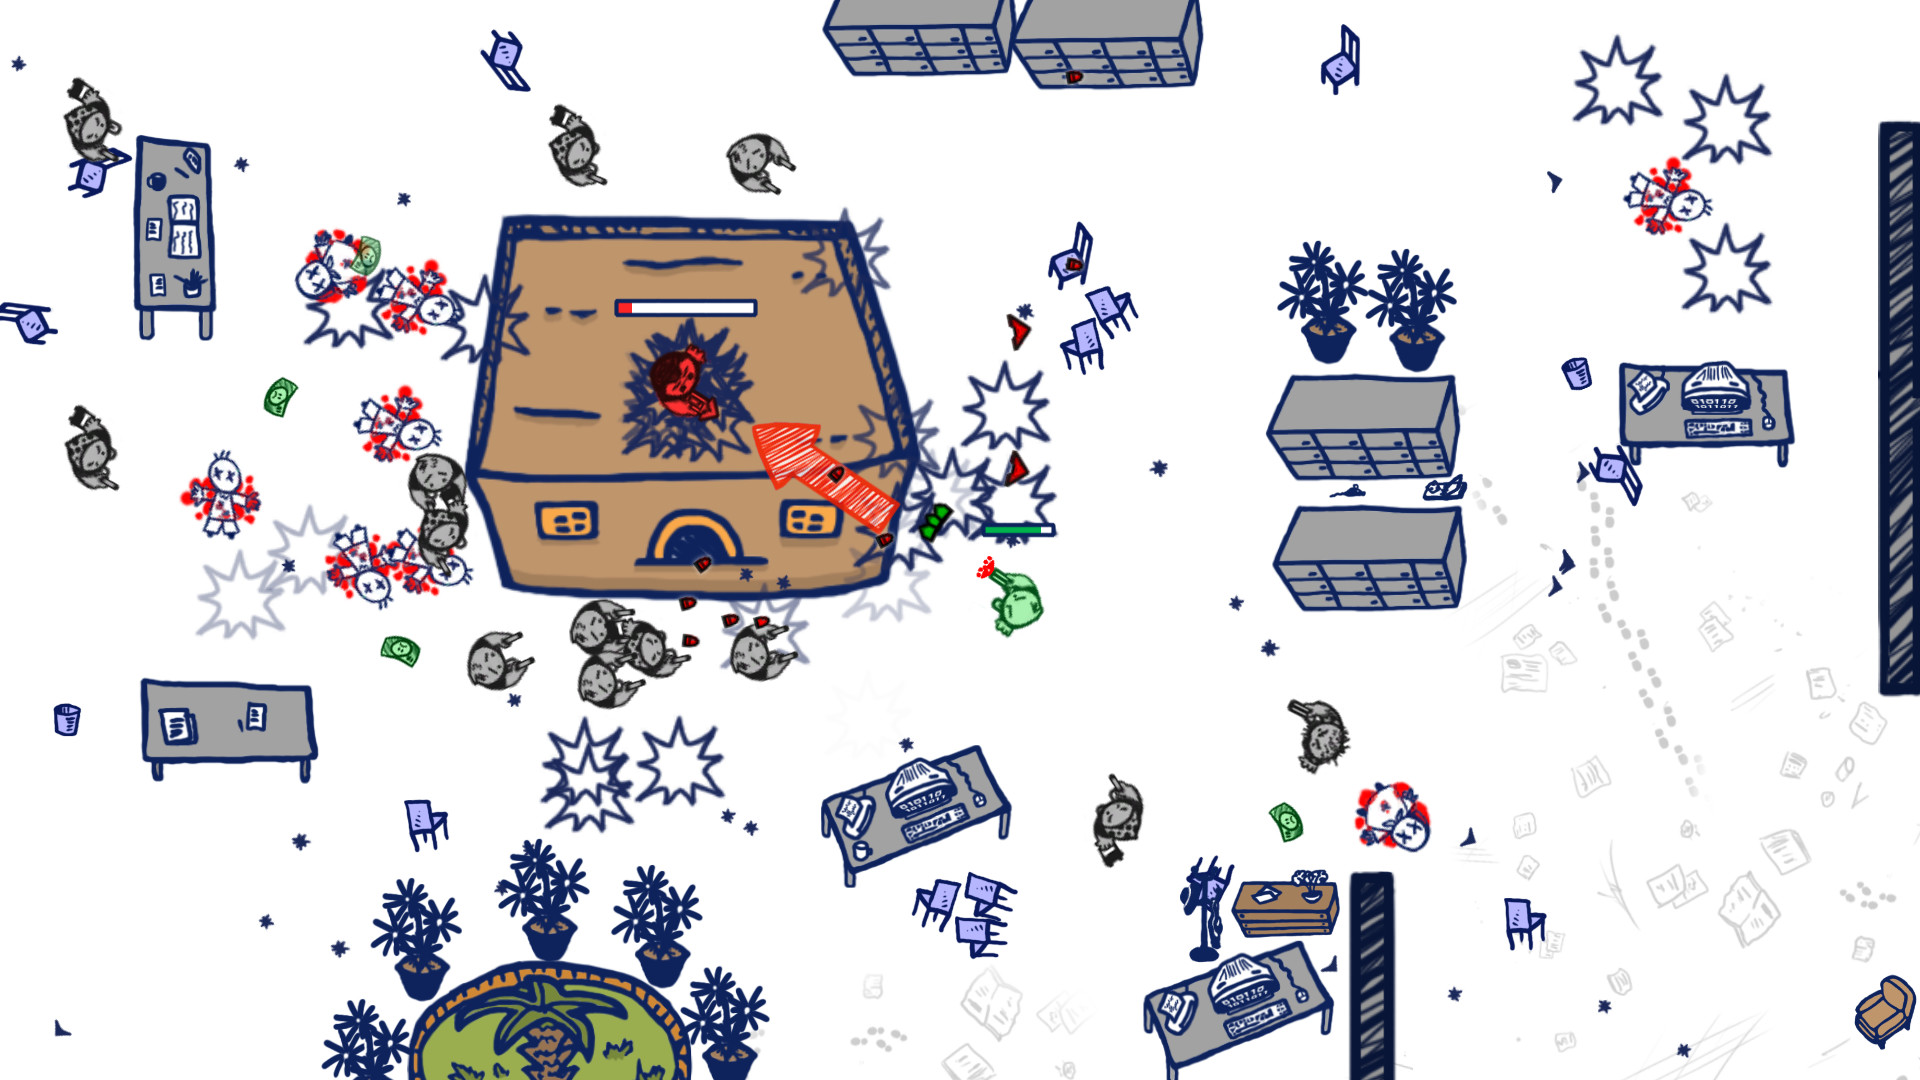 State of Anarchy screenshot